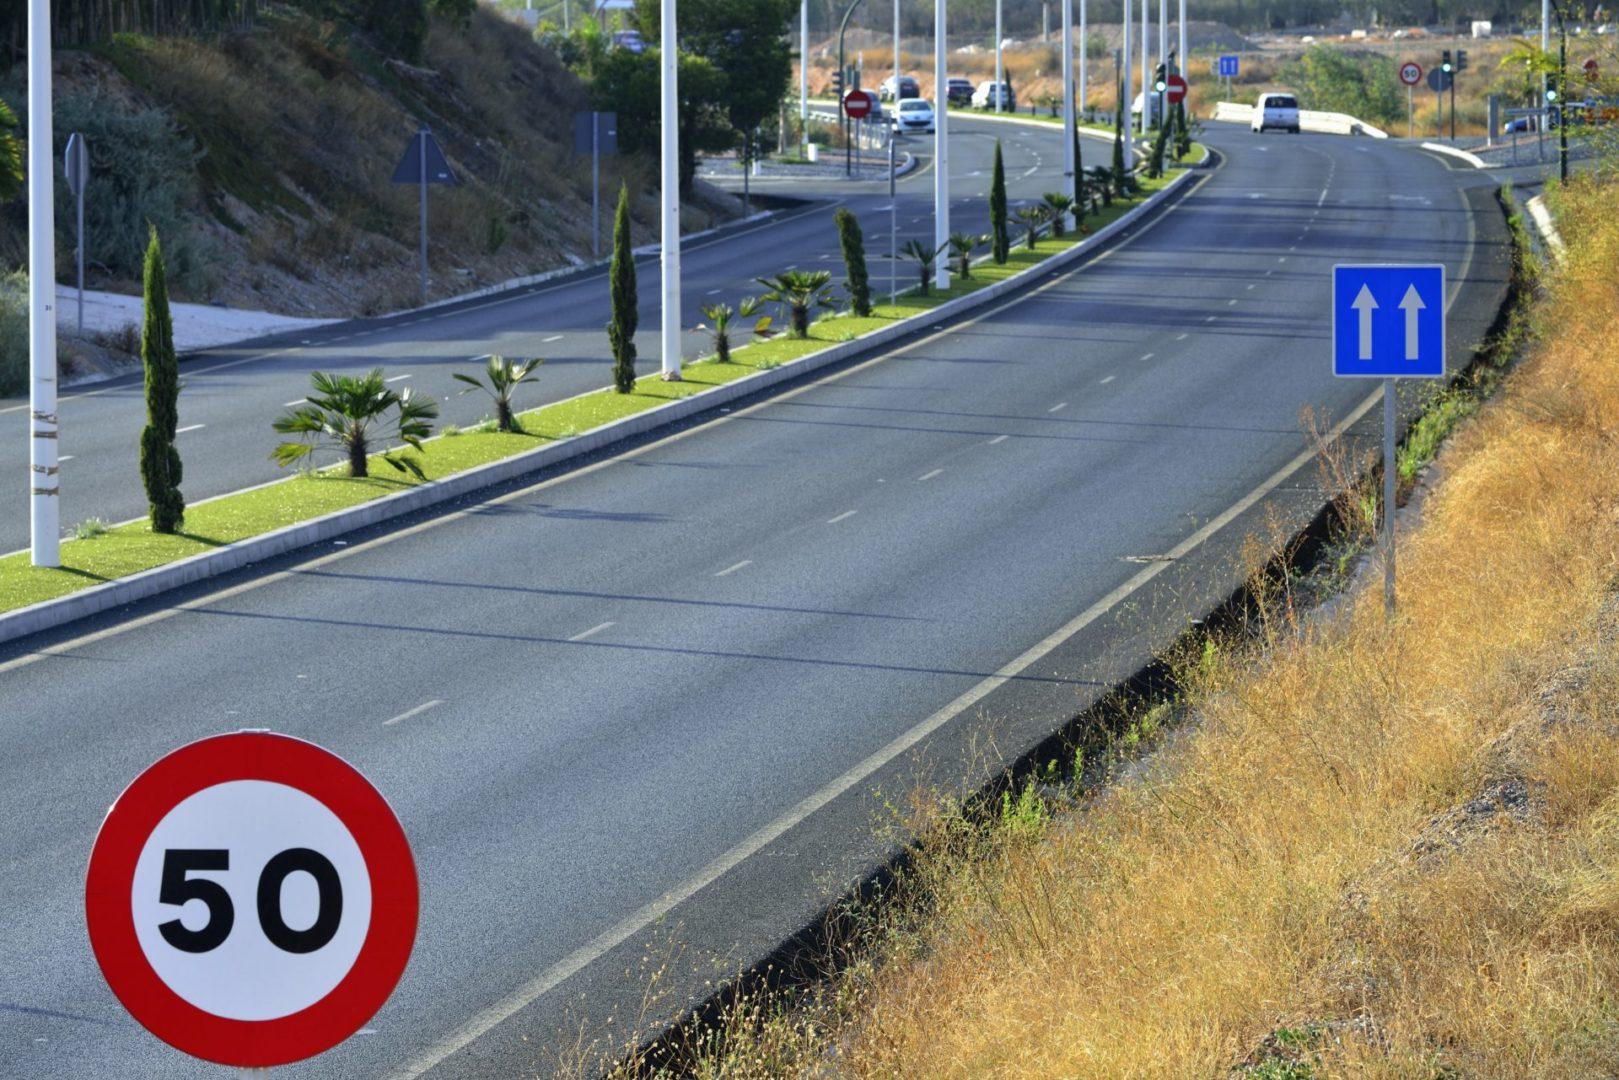 Carretera A4 -12-Urdecon